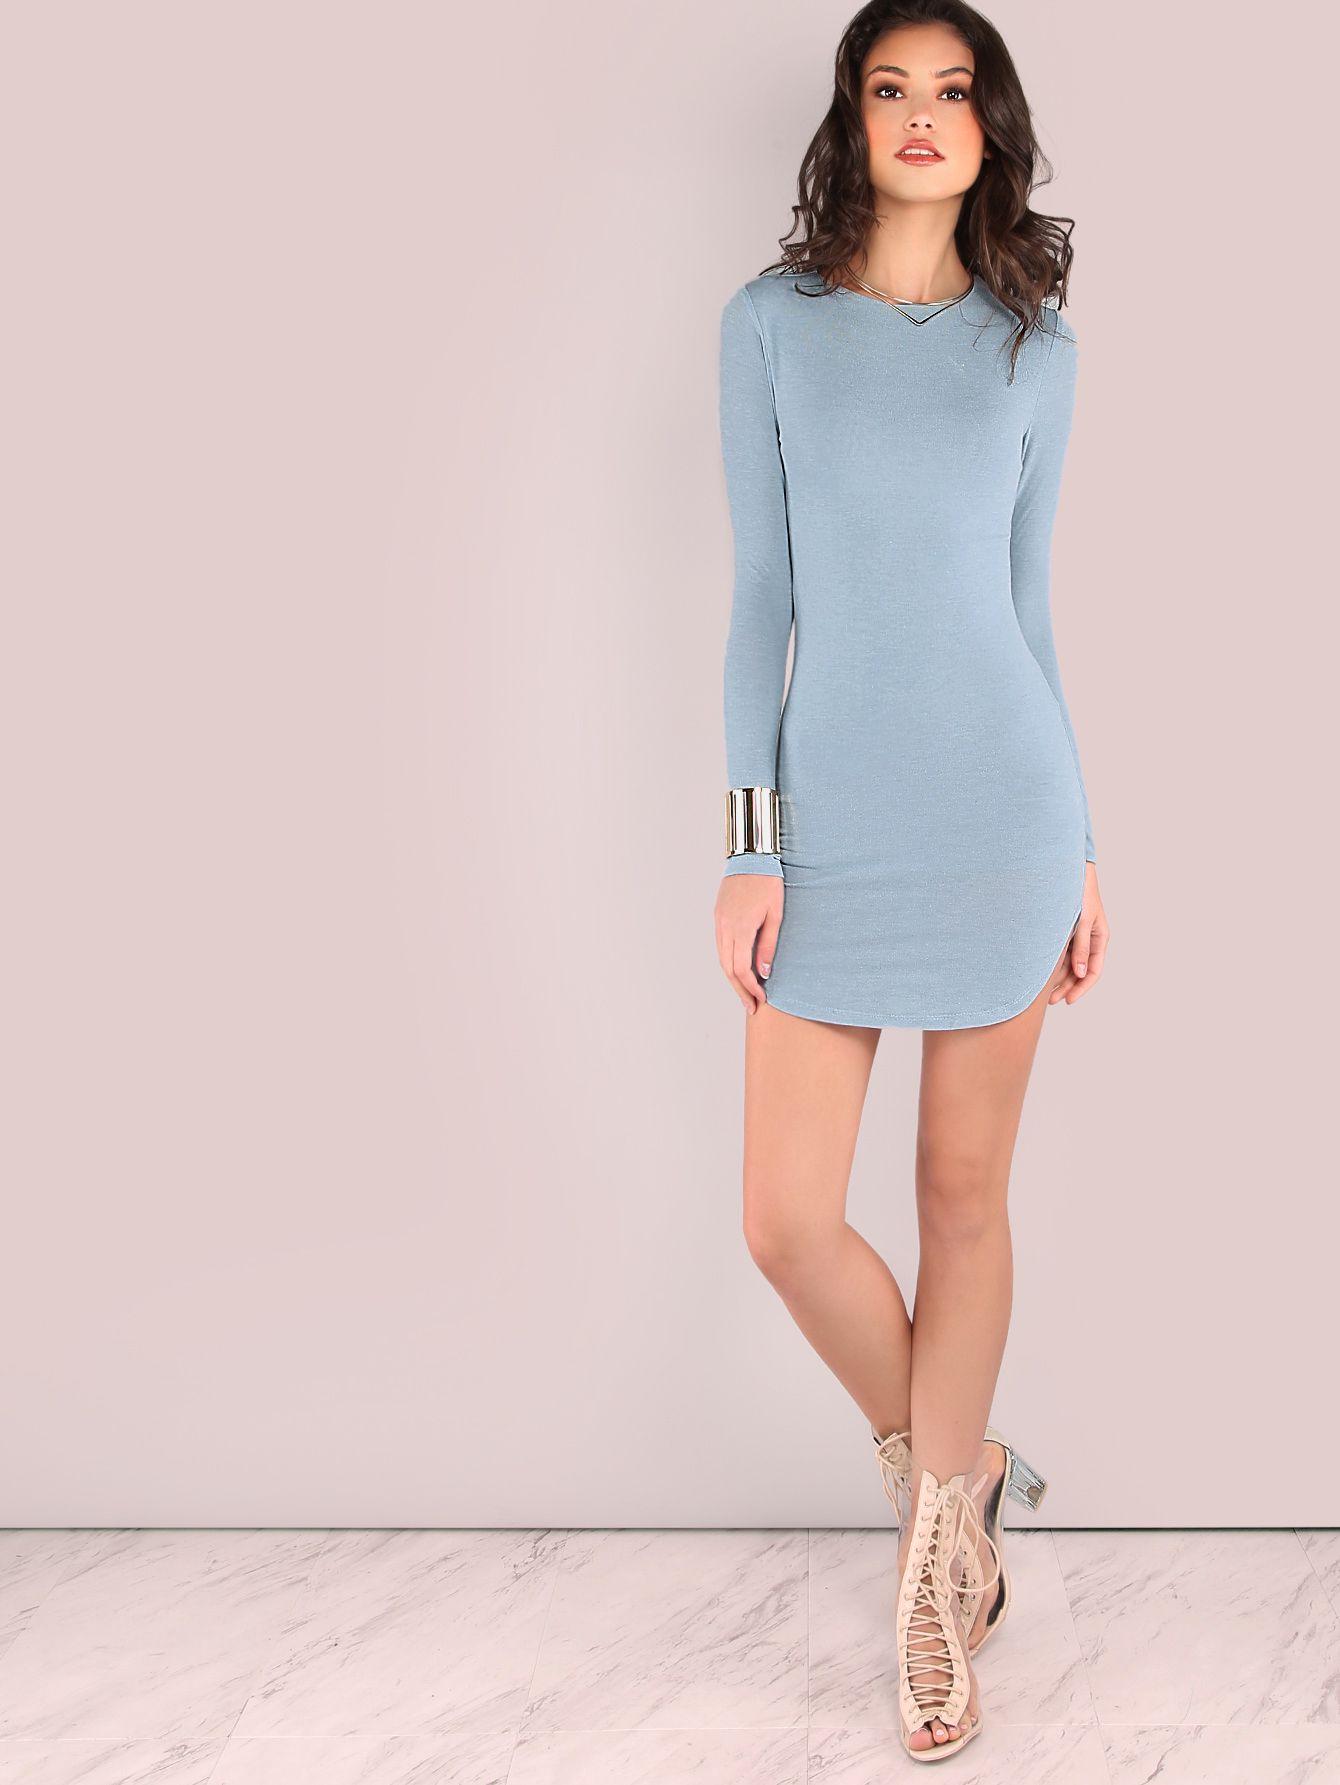 Blue Long Sleeve Curved Hem Bodycon Dress